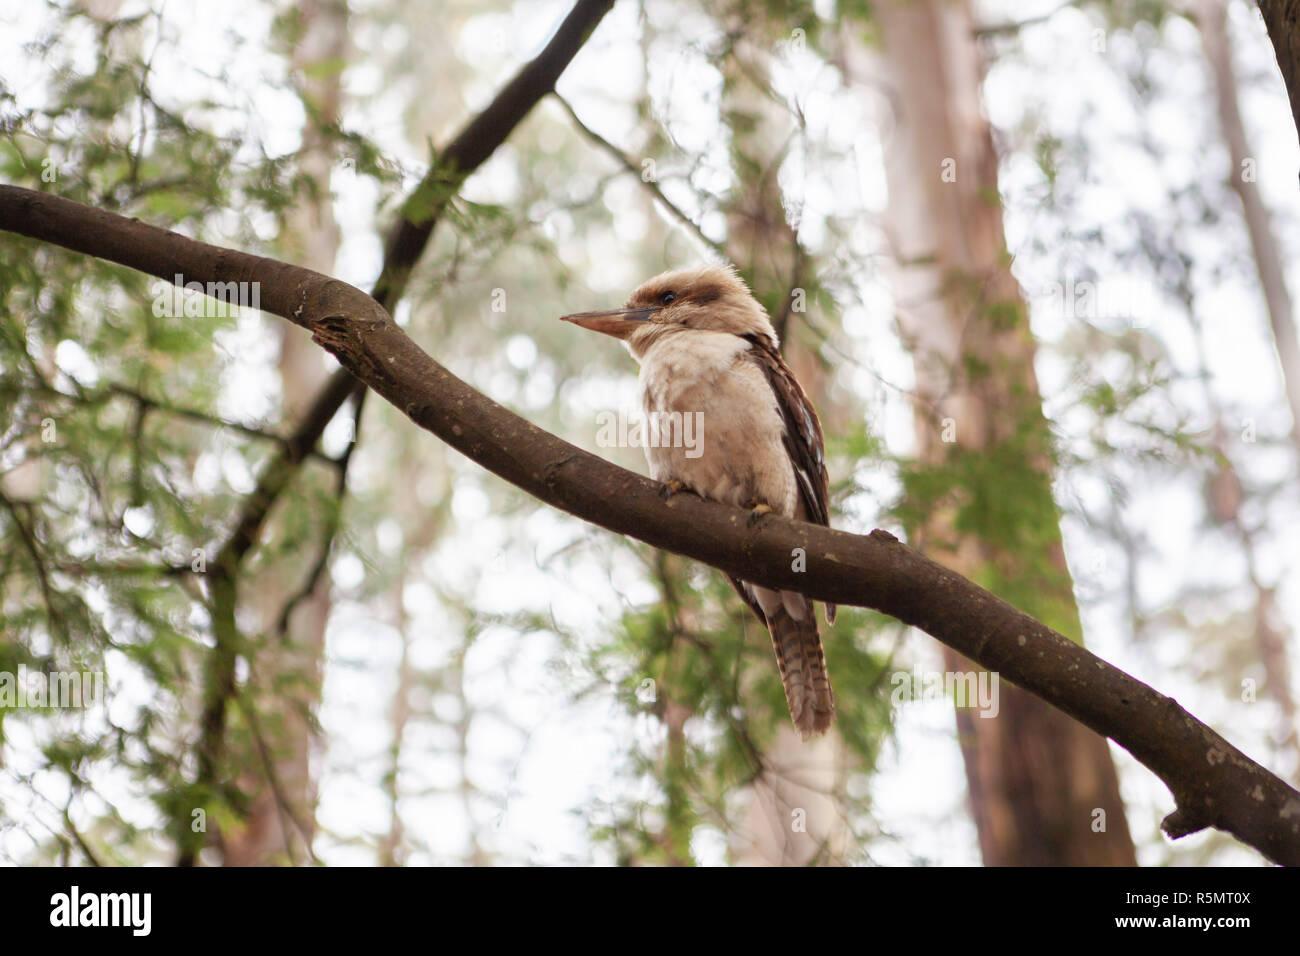 Kookaburra bird perching on a branch on blurred background - Stock Image